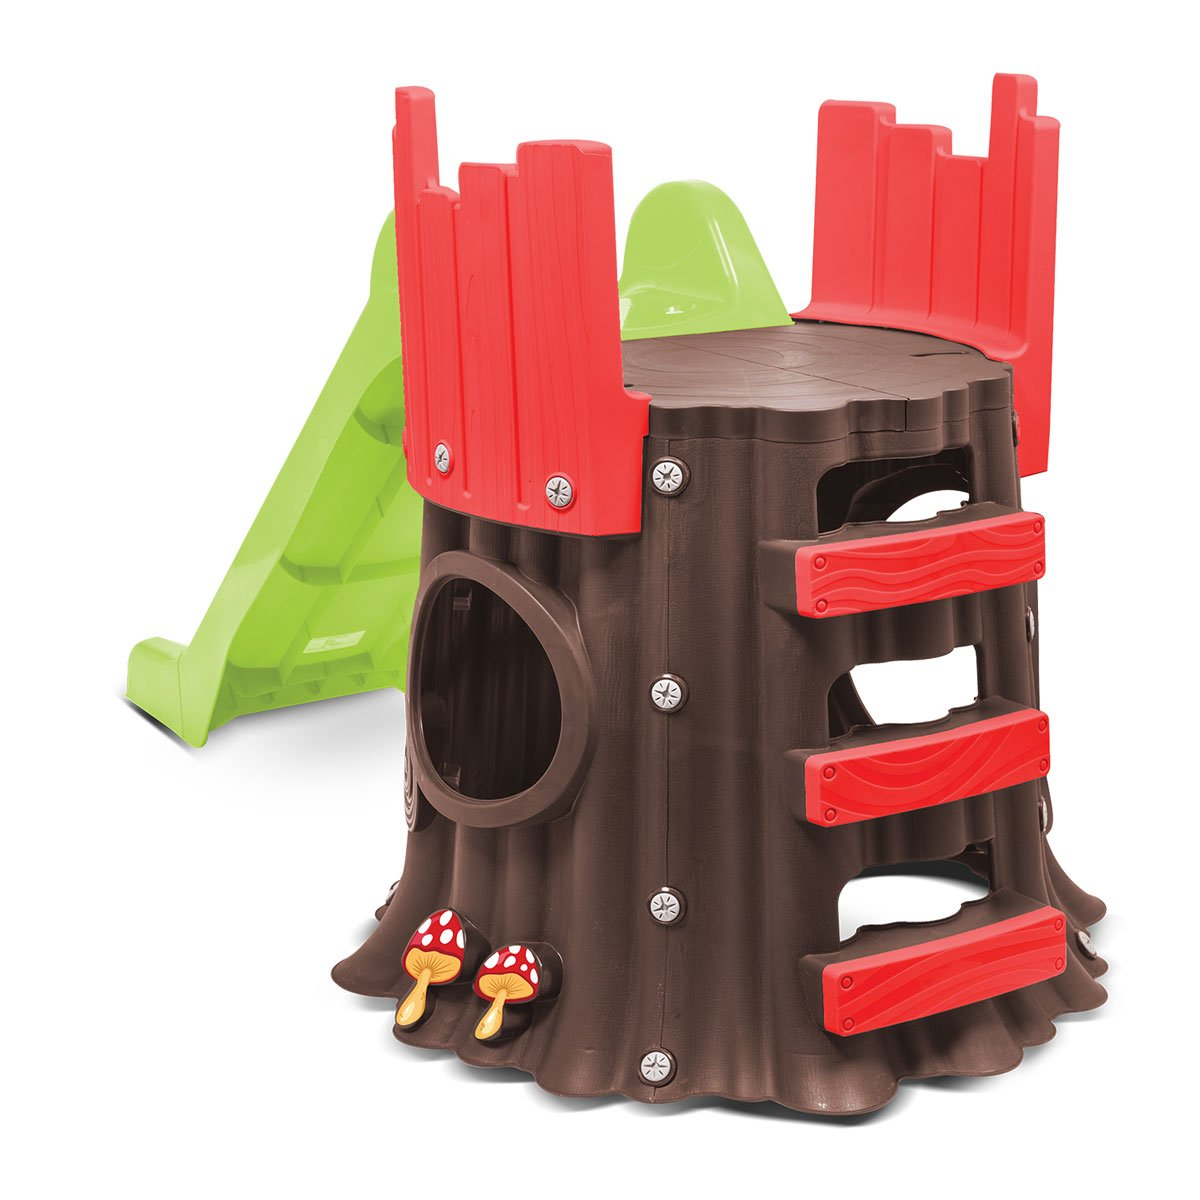 Tree shaped house and slide